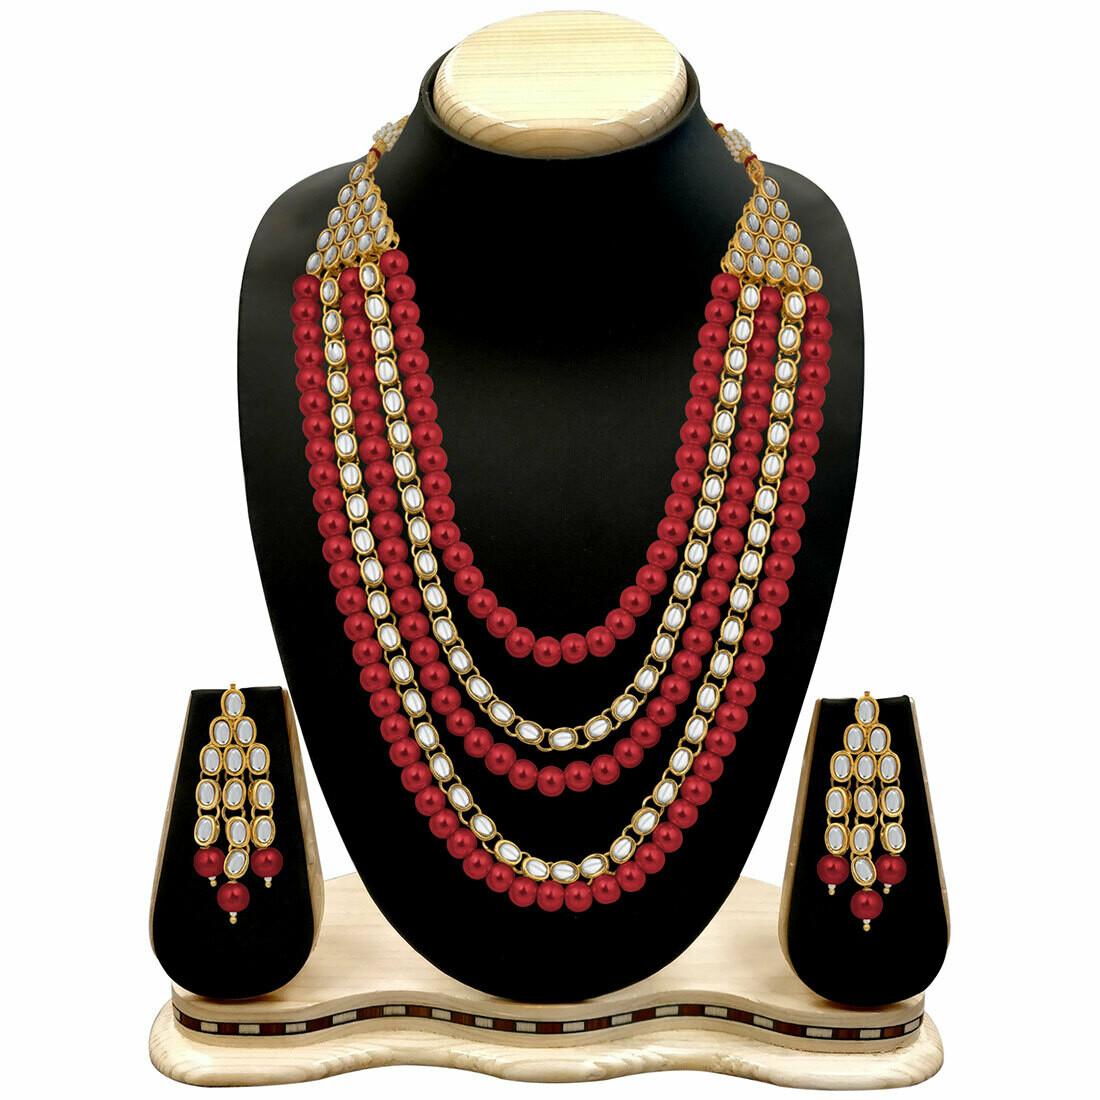 Aheli Kundan Pearl Long Multi Layered Necklace Earring Set Jewelry For Women